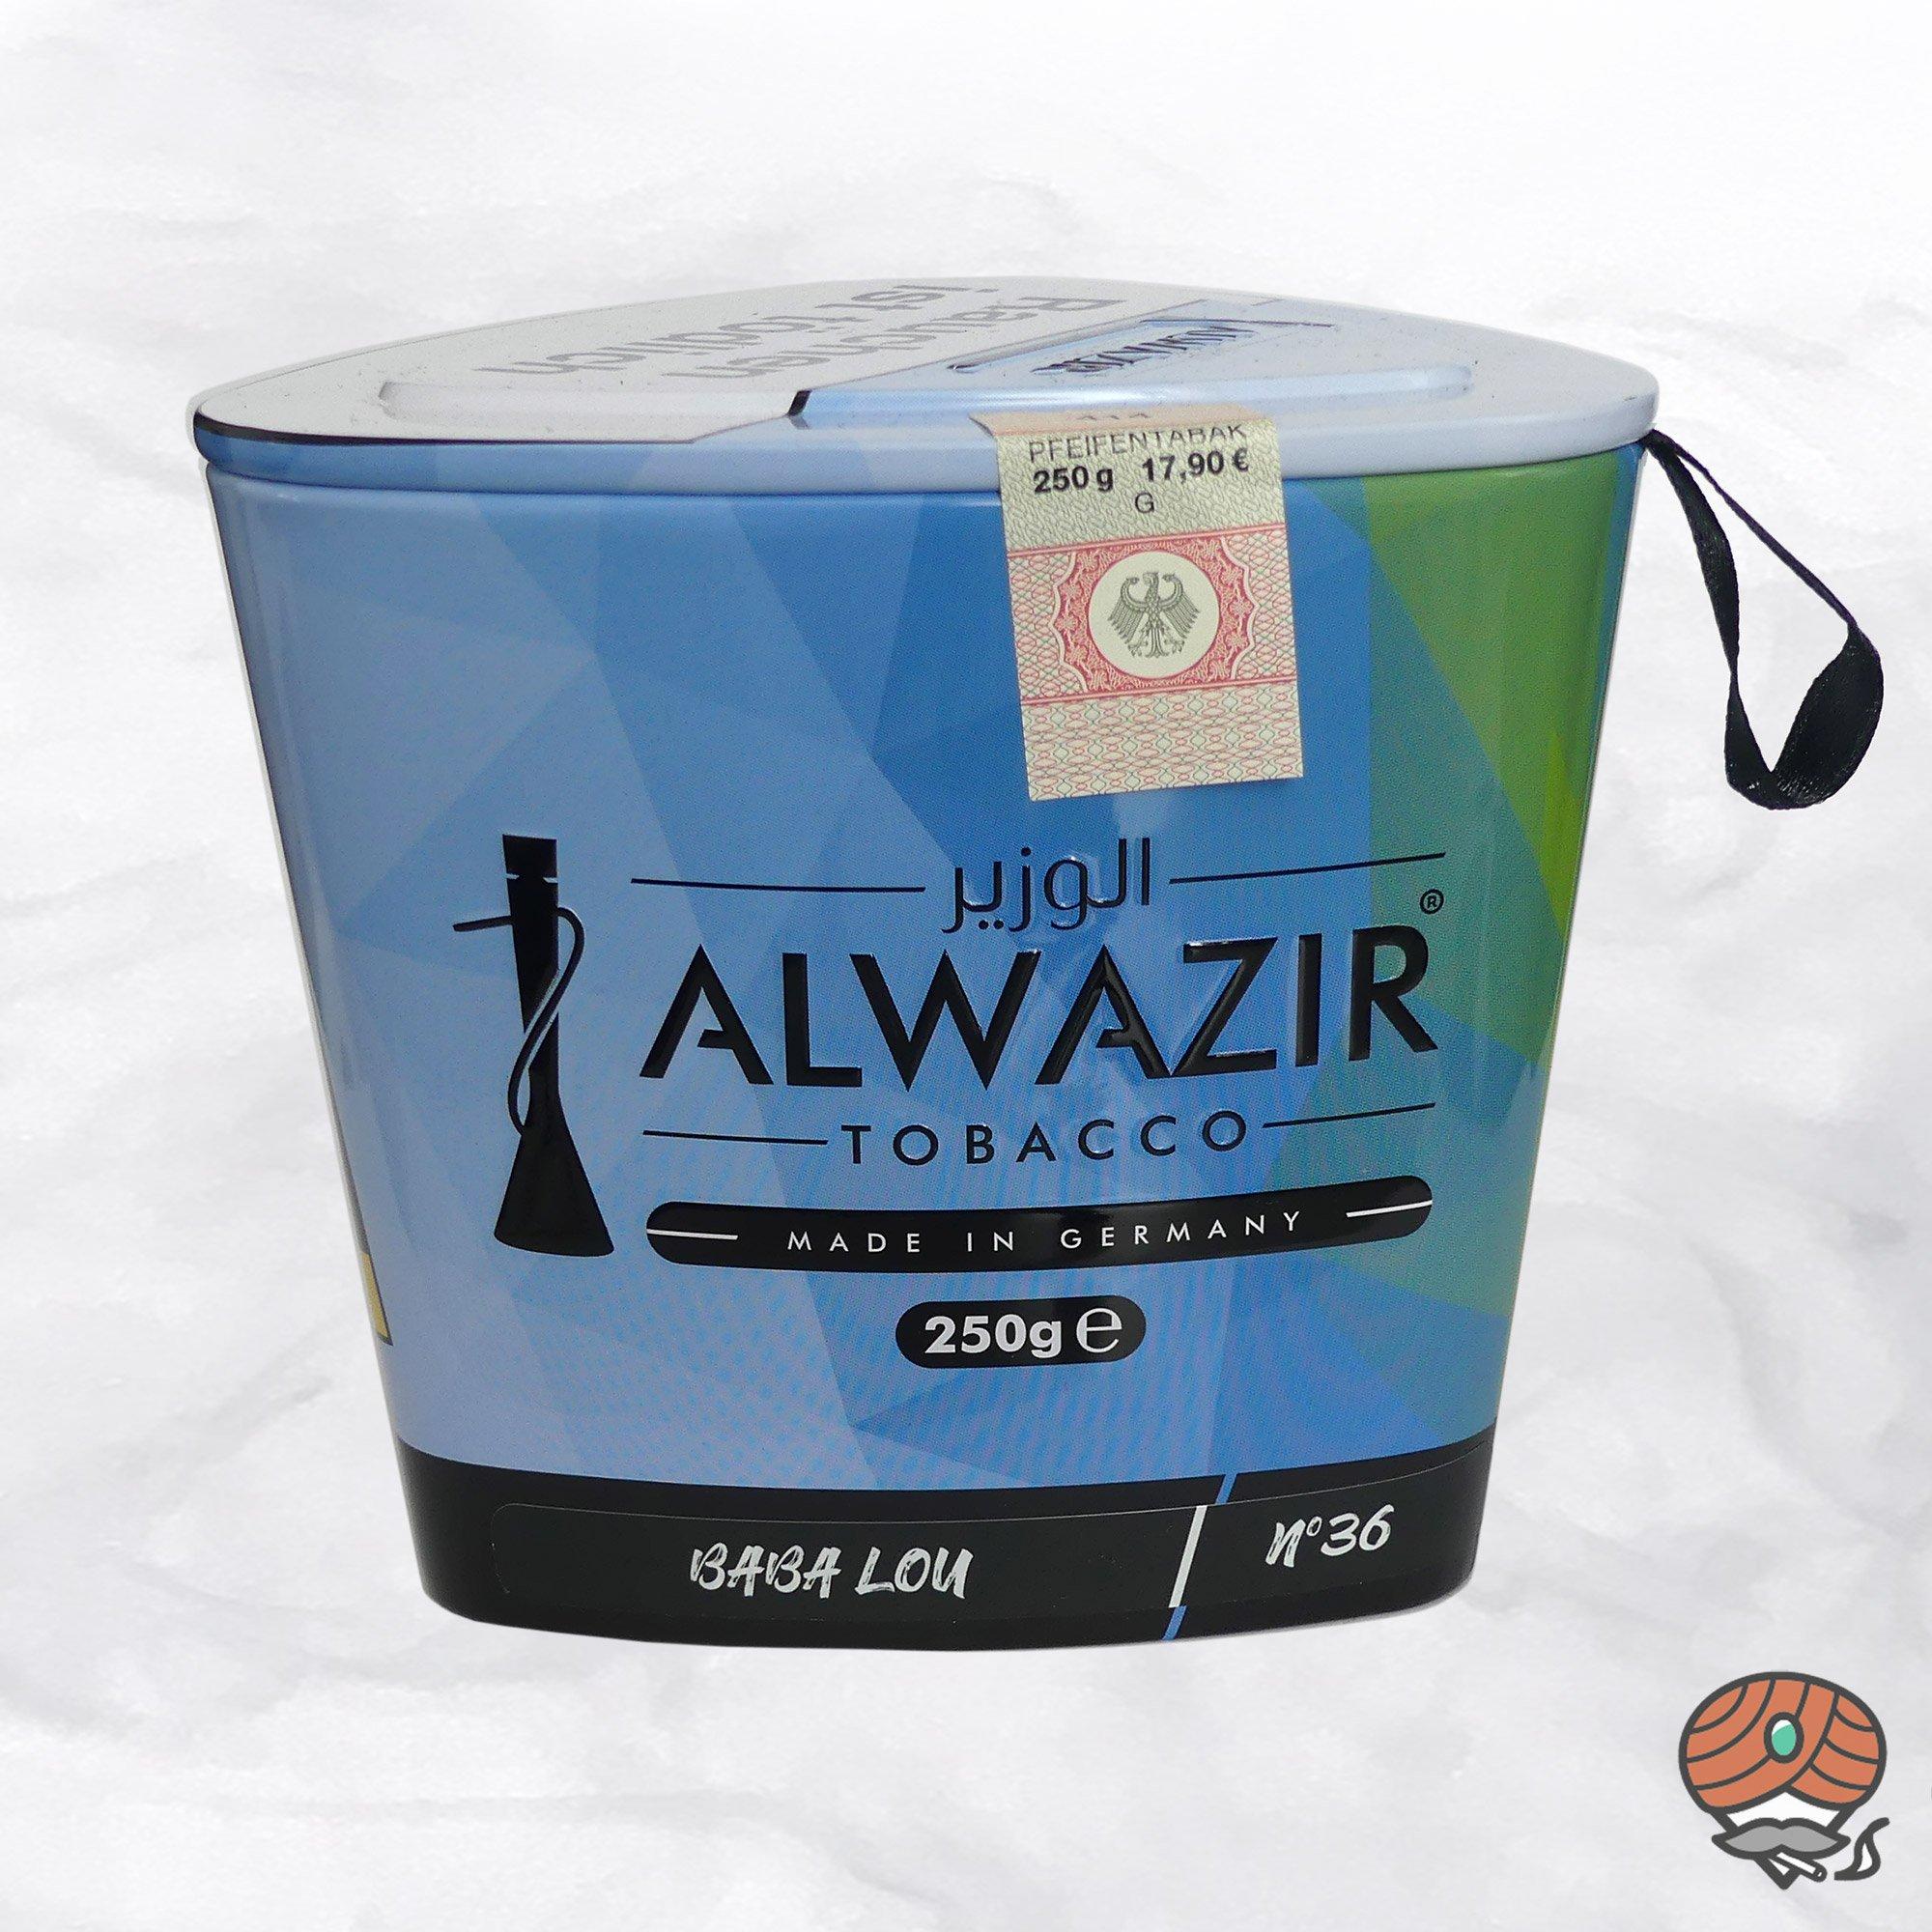 Alwazir Shisha Tabak - No. 36 - BABA LOU 250g